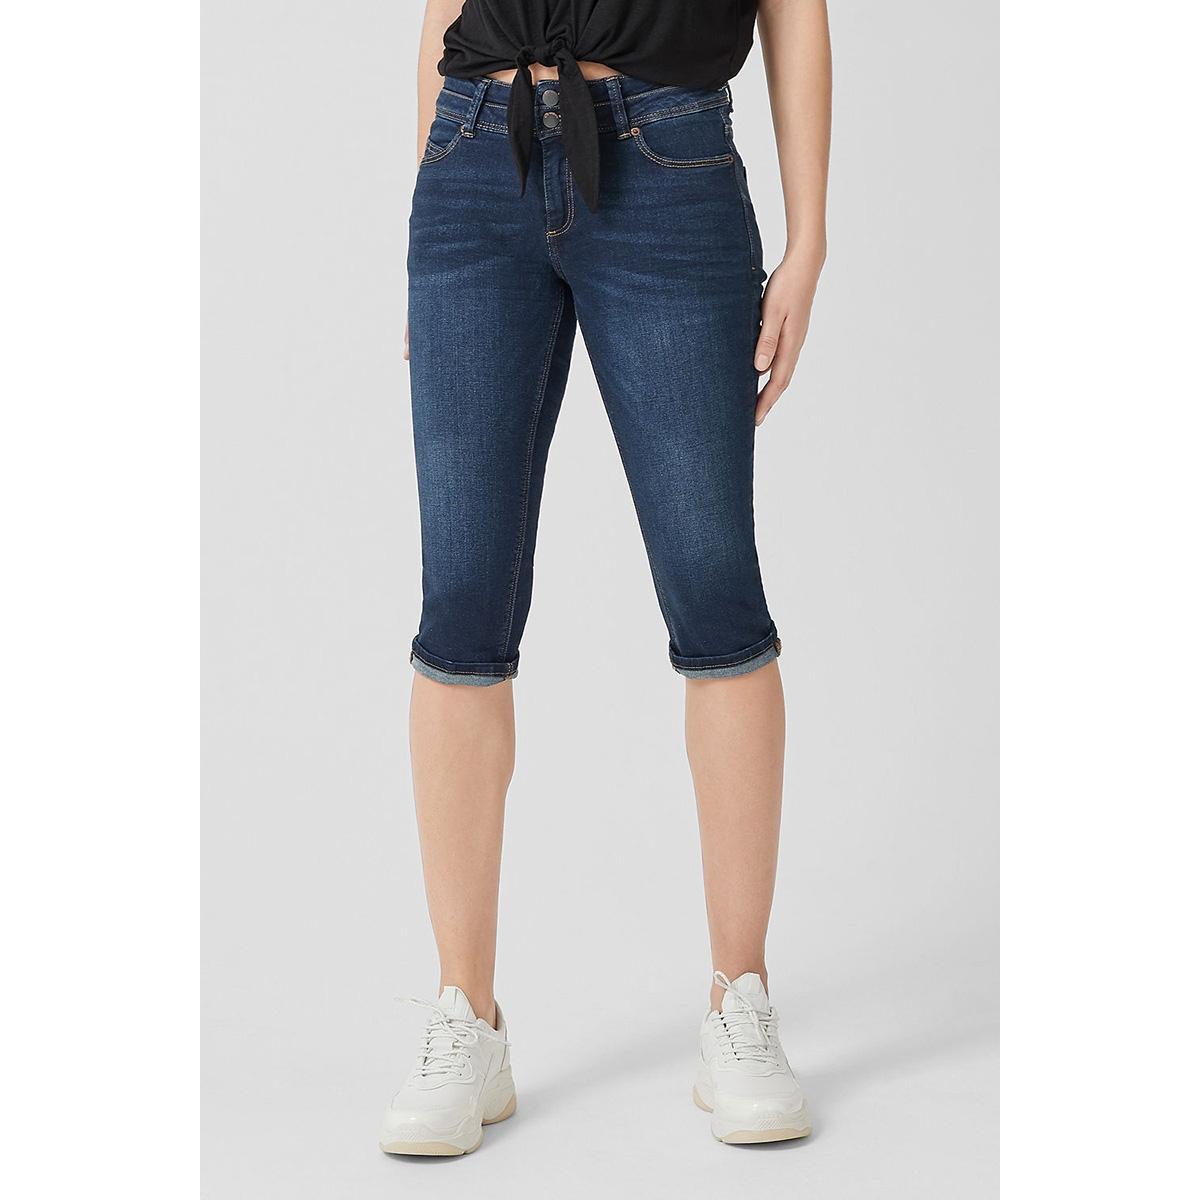 catie 3 4 denim 45899724874 q/s designed by jeans 58z6